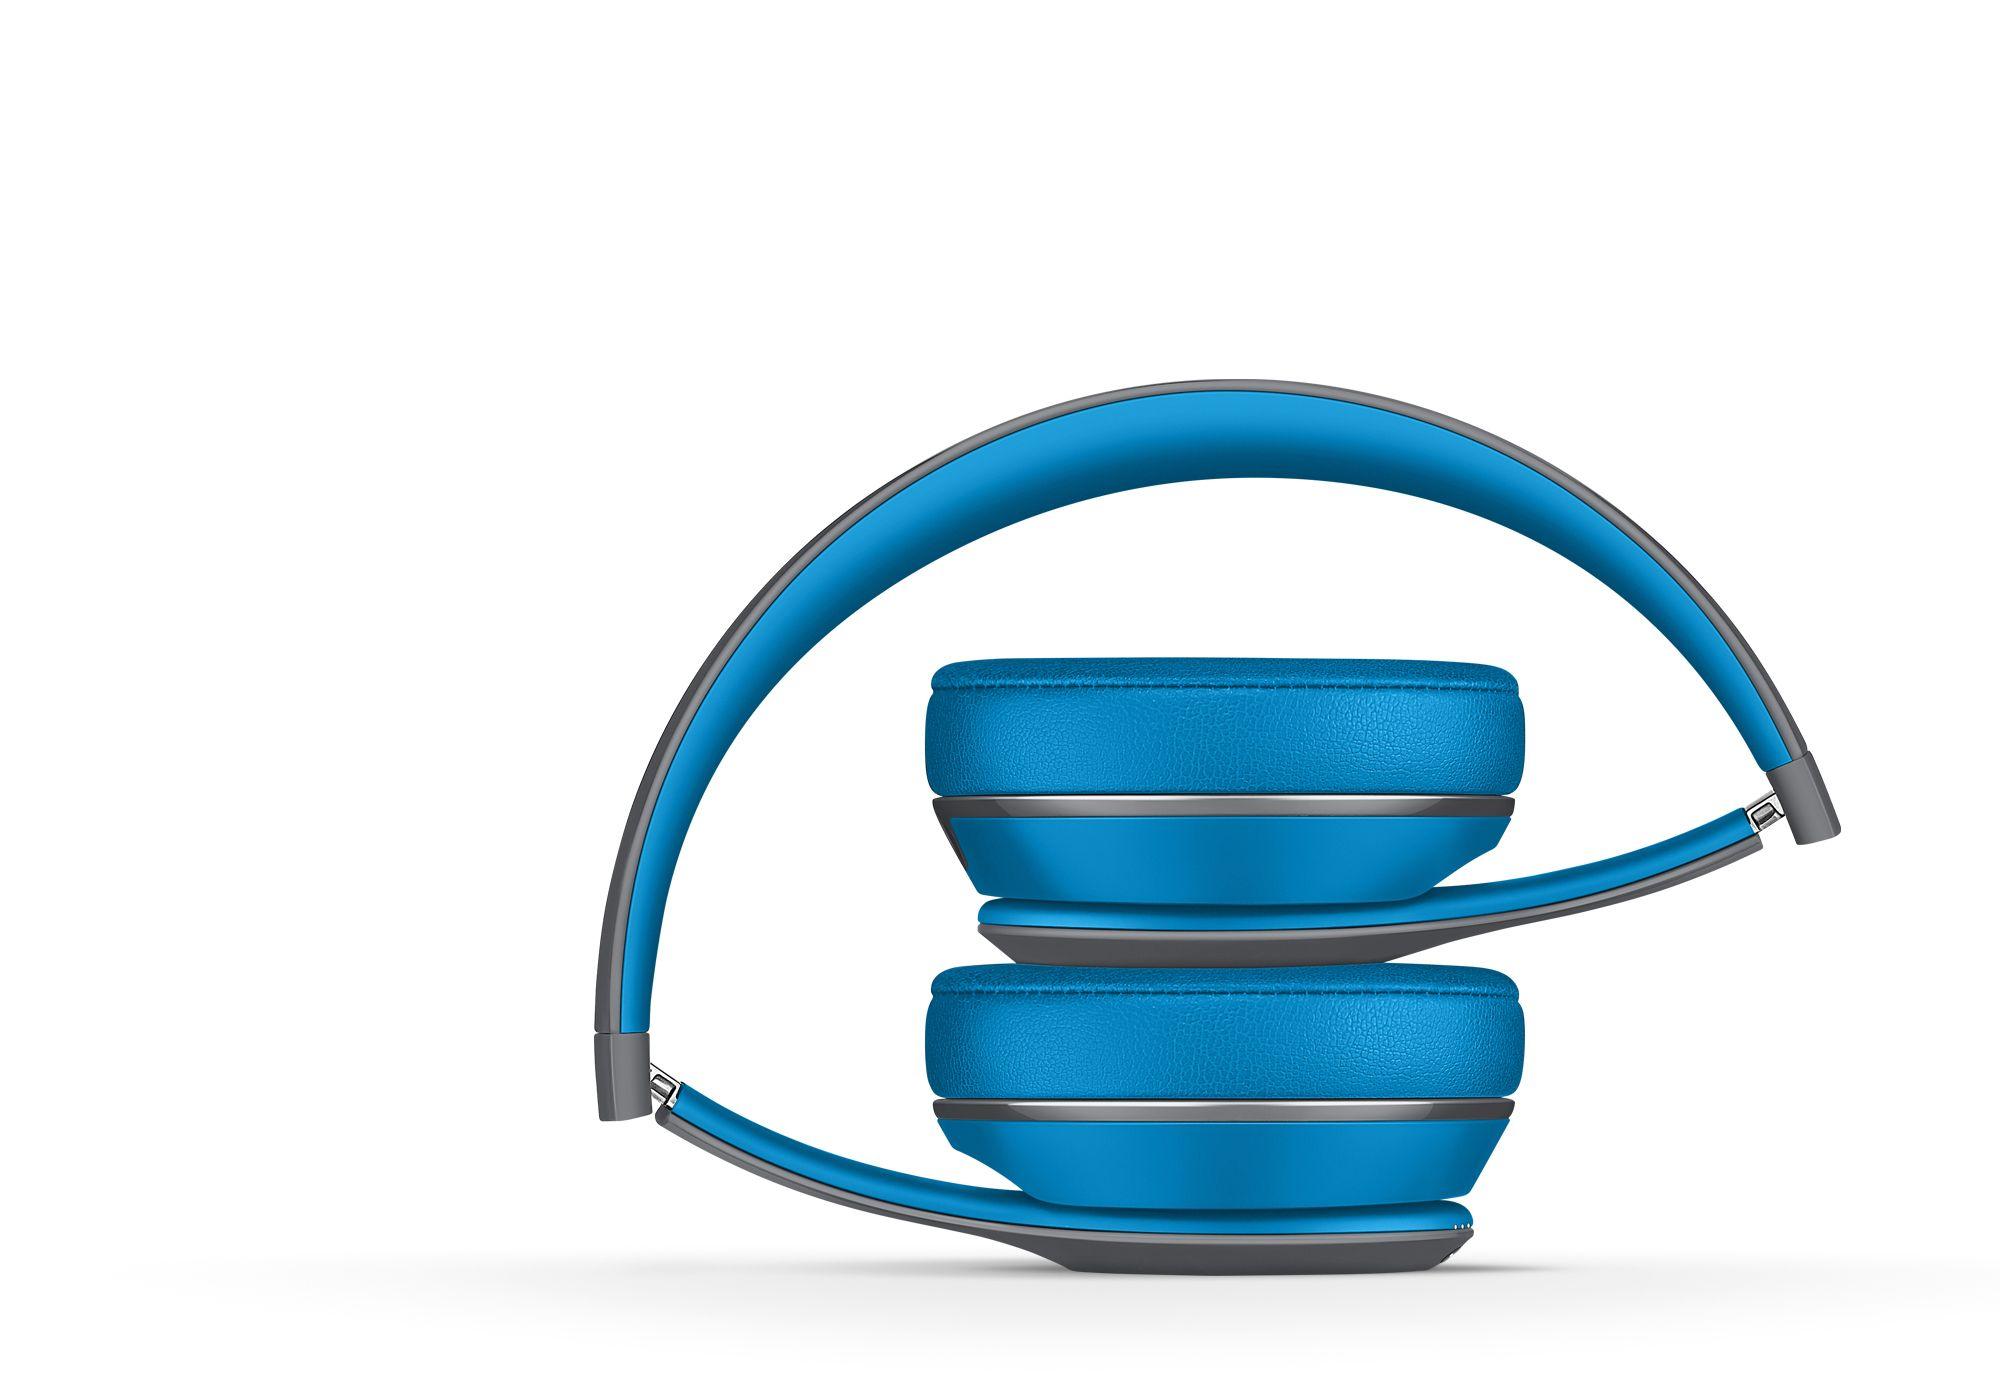 Solo 2 Wireless Active Kopfhorer Blau Beats Kopfhorer Kopfhorer